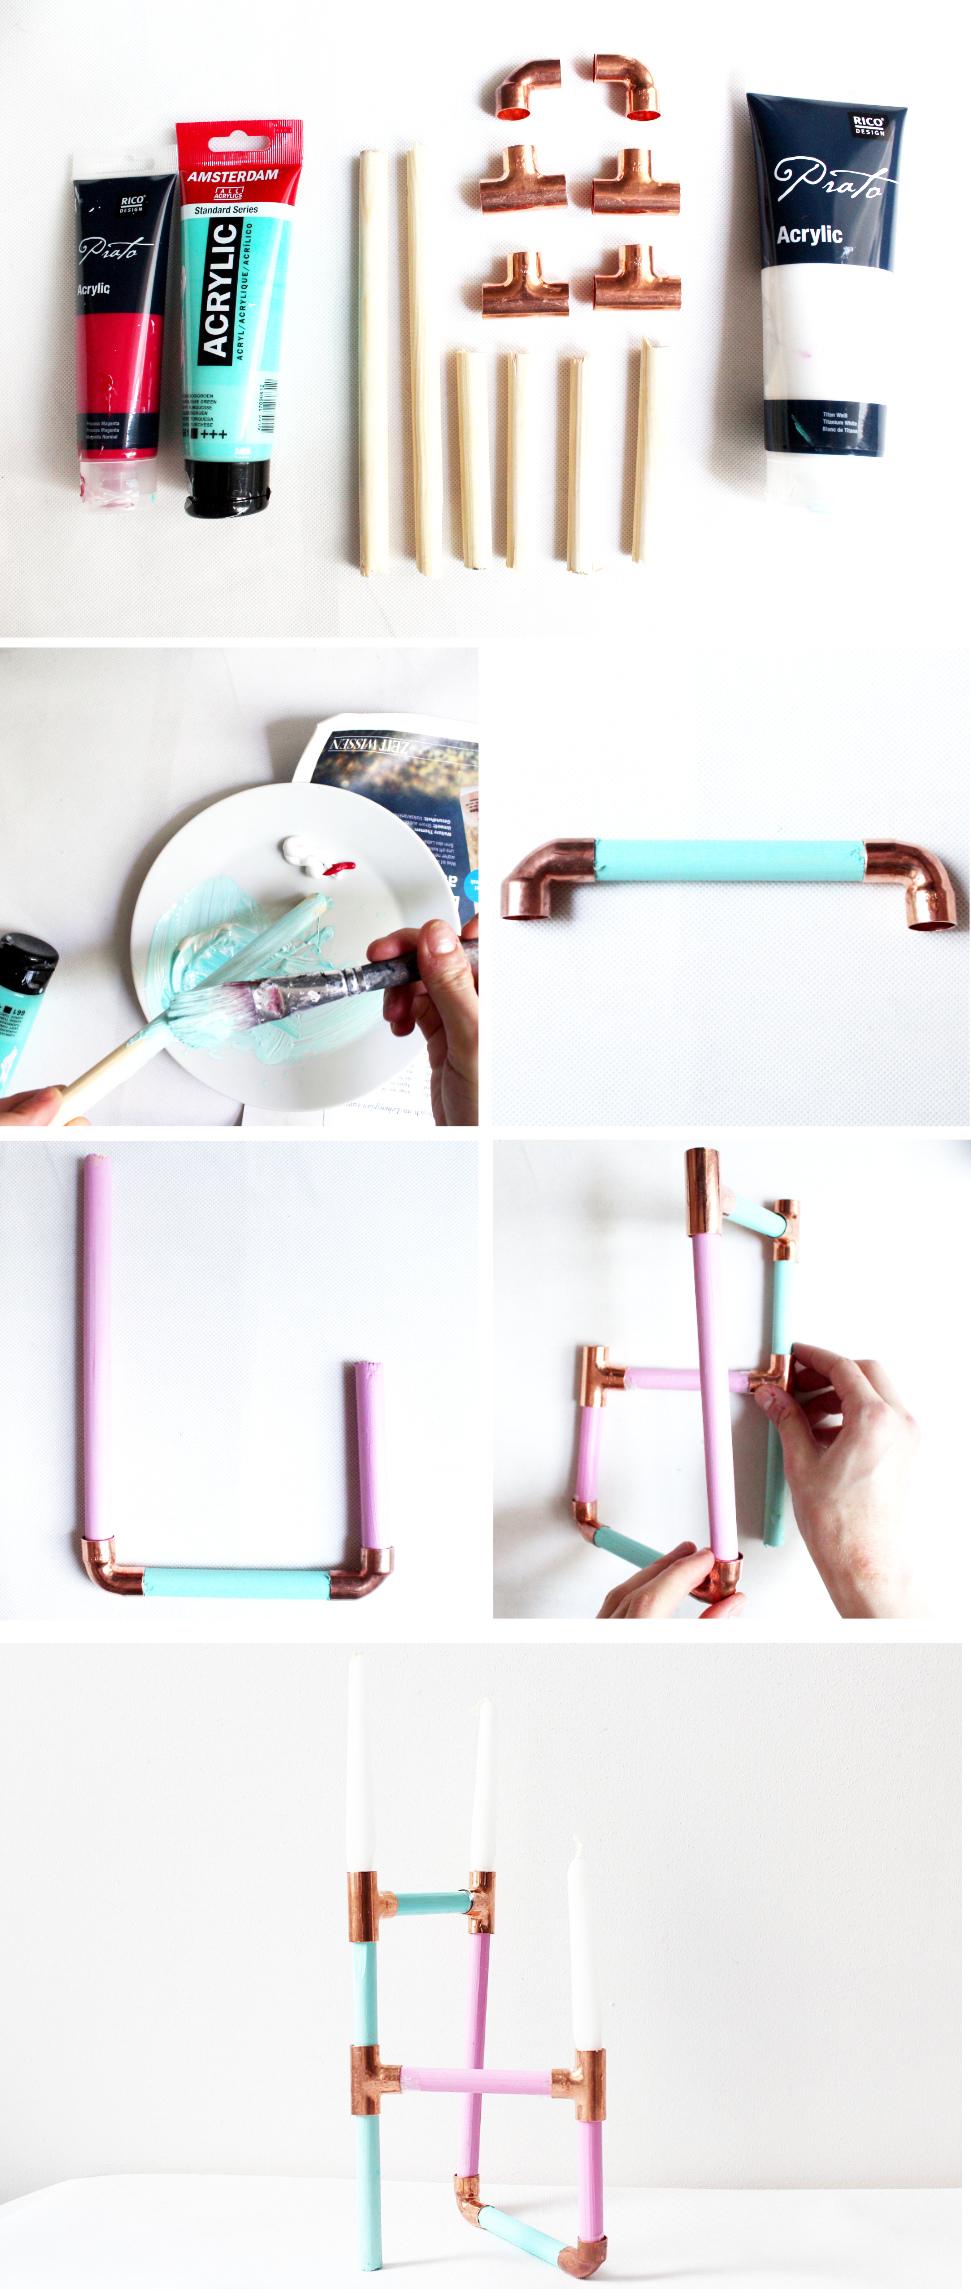 Kerzenständer Holz Anleitung ~ Kerzenständer aus Kupfer Selber machen  DIY Anleitung